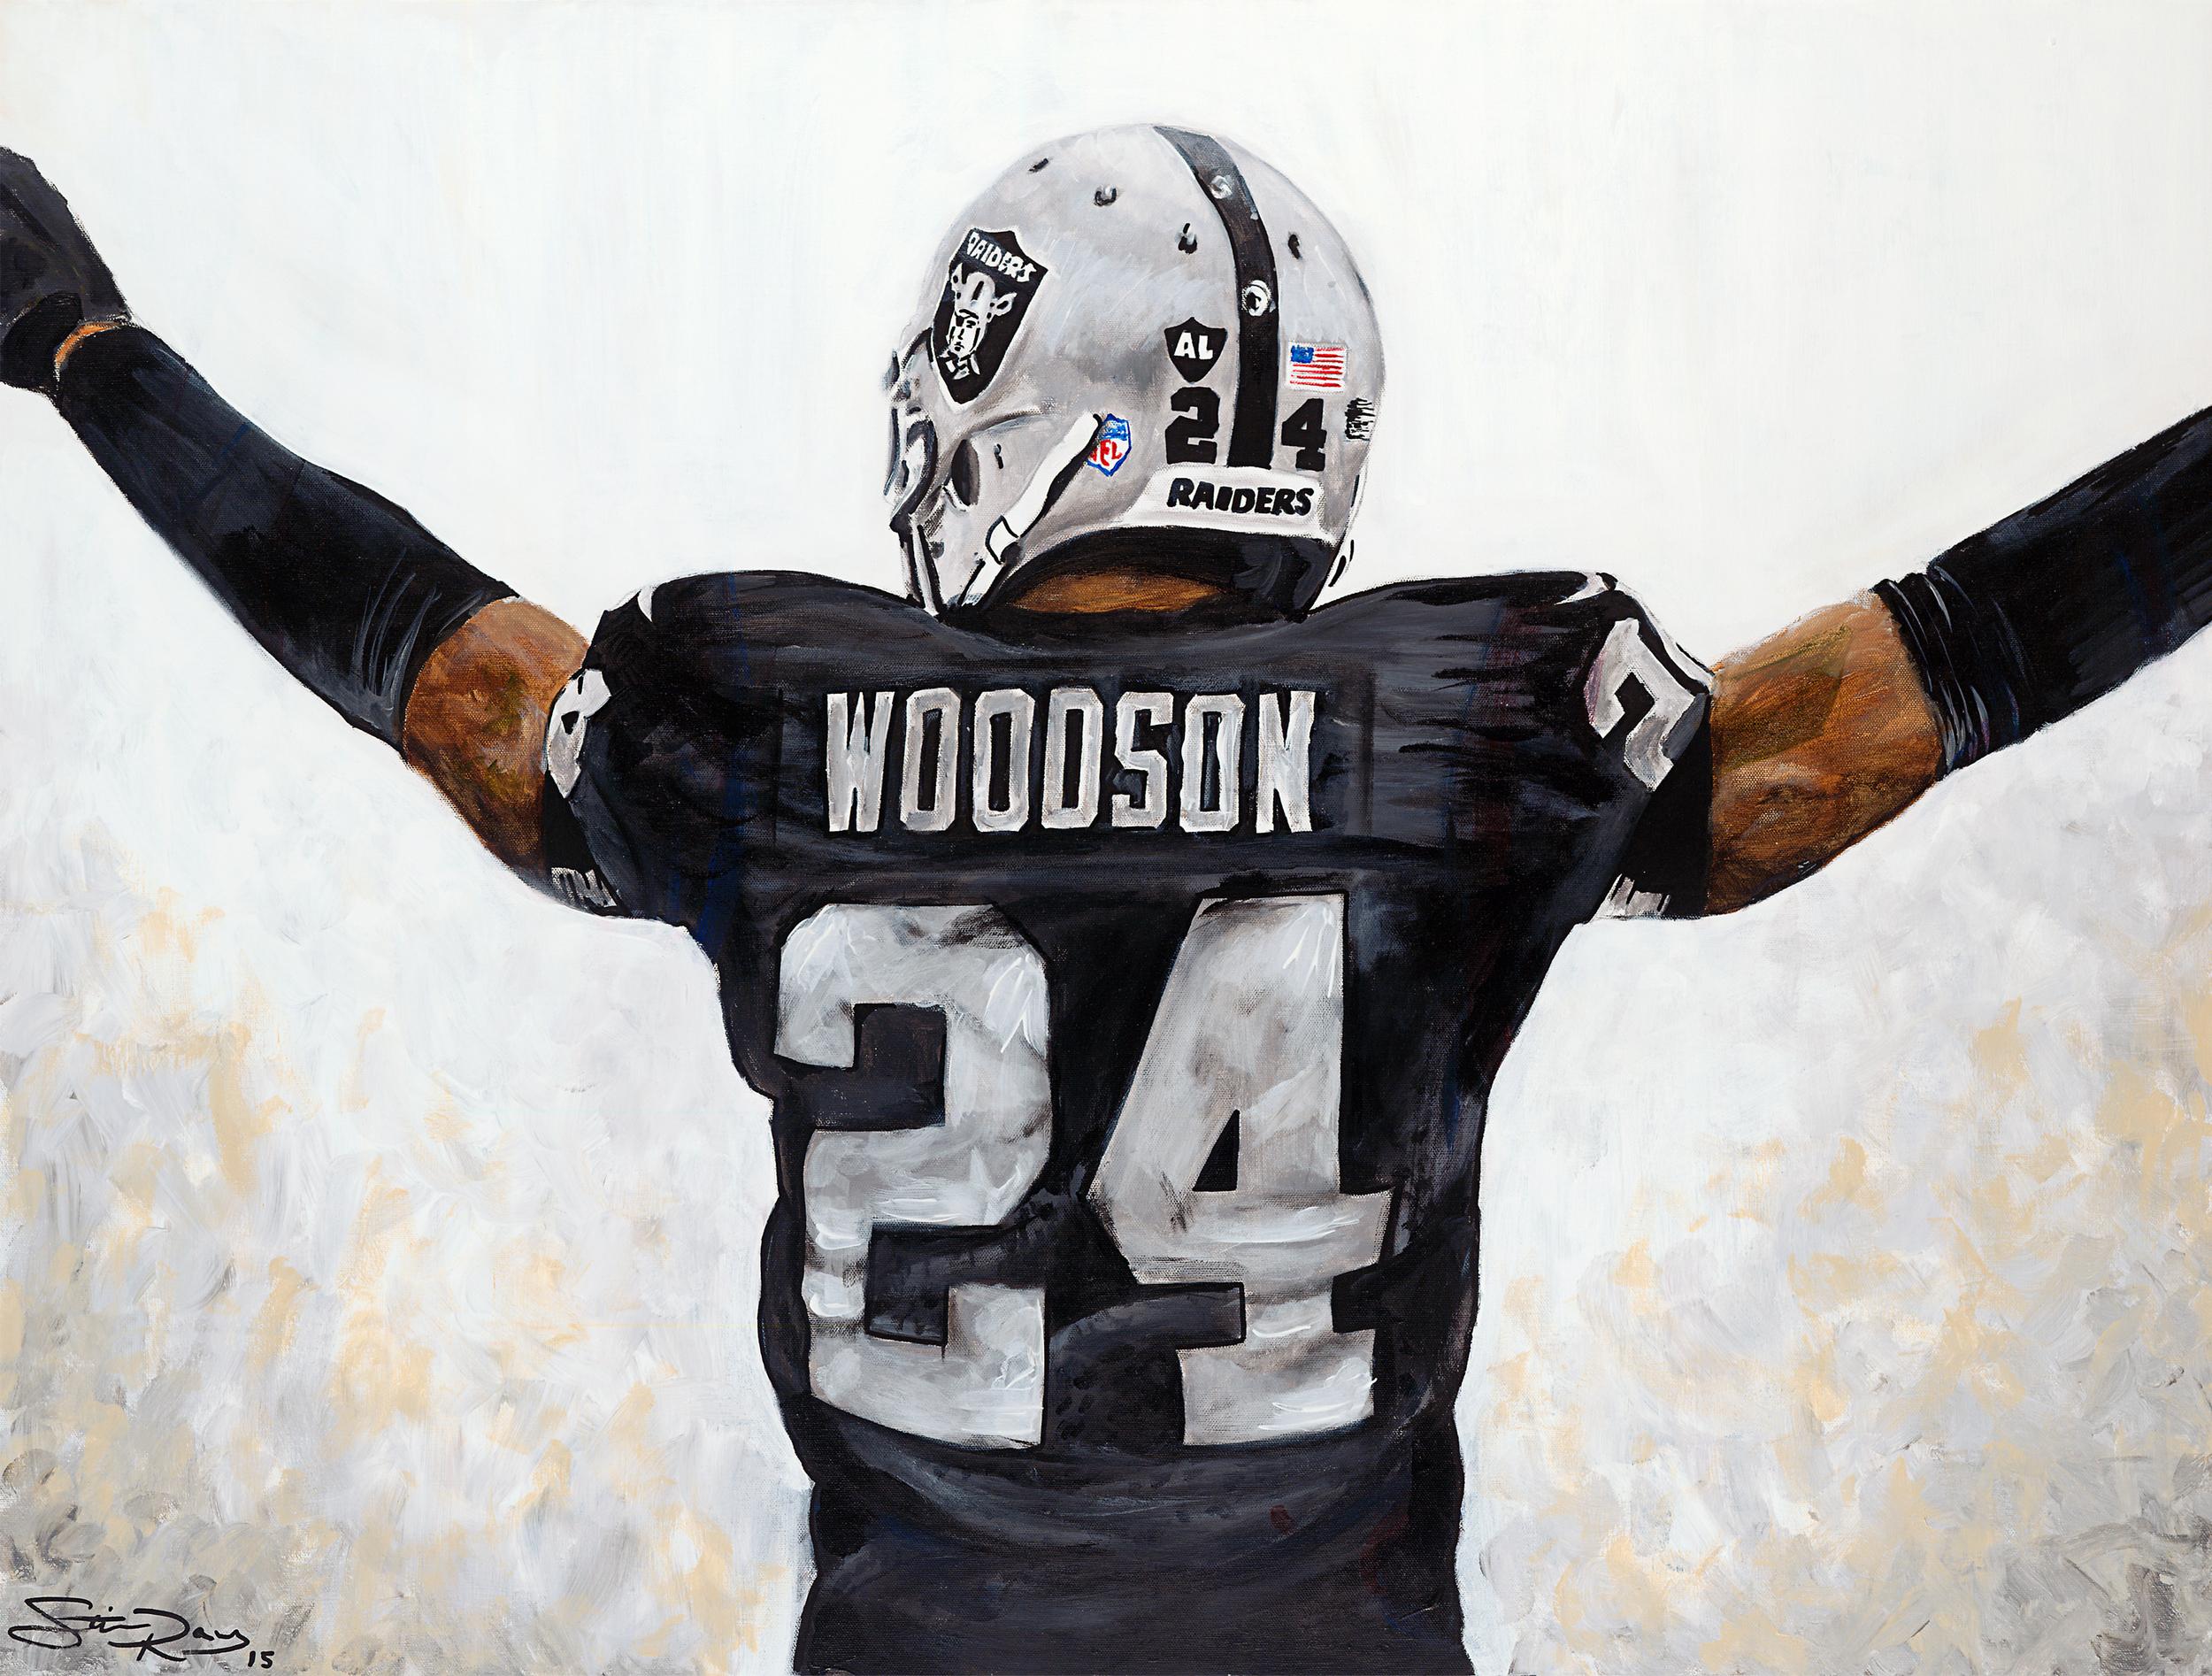 Woodson low res.jpg